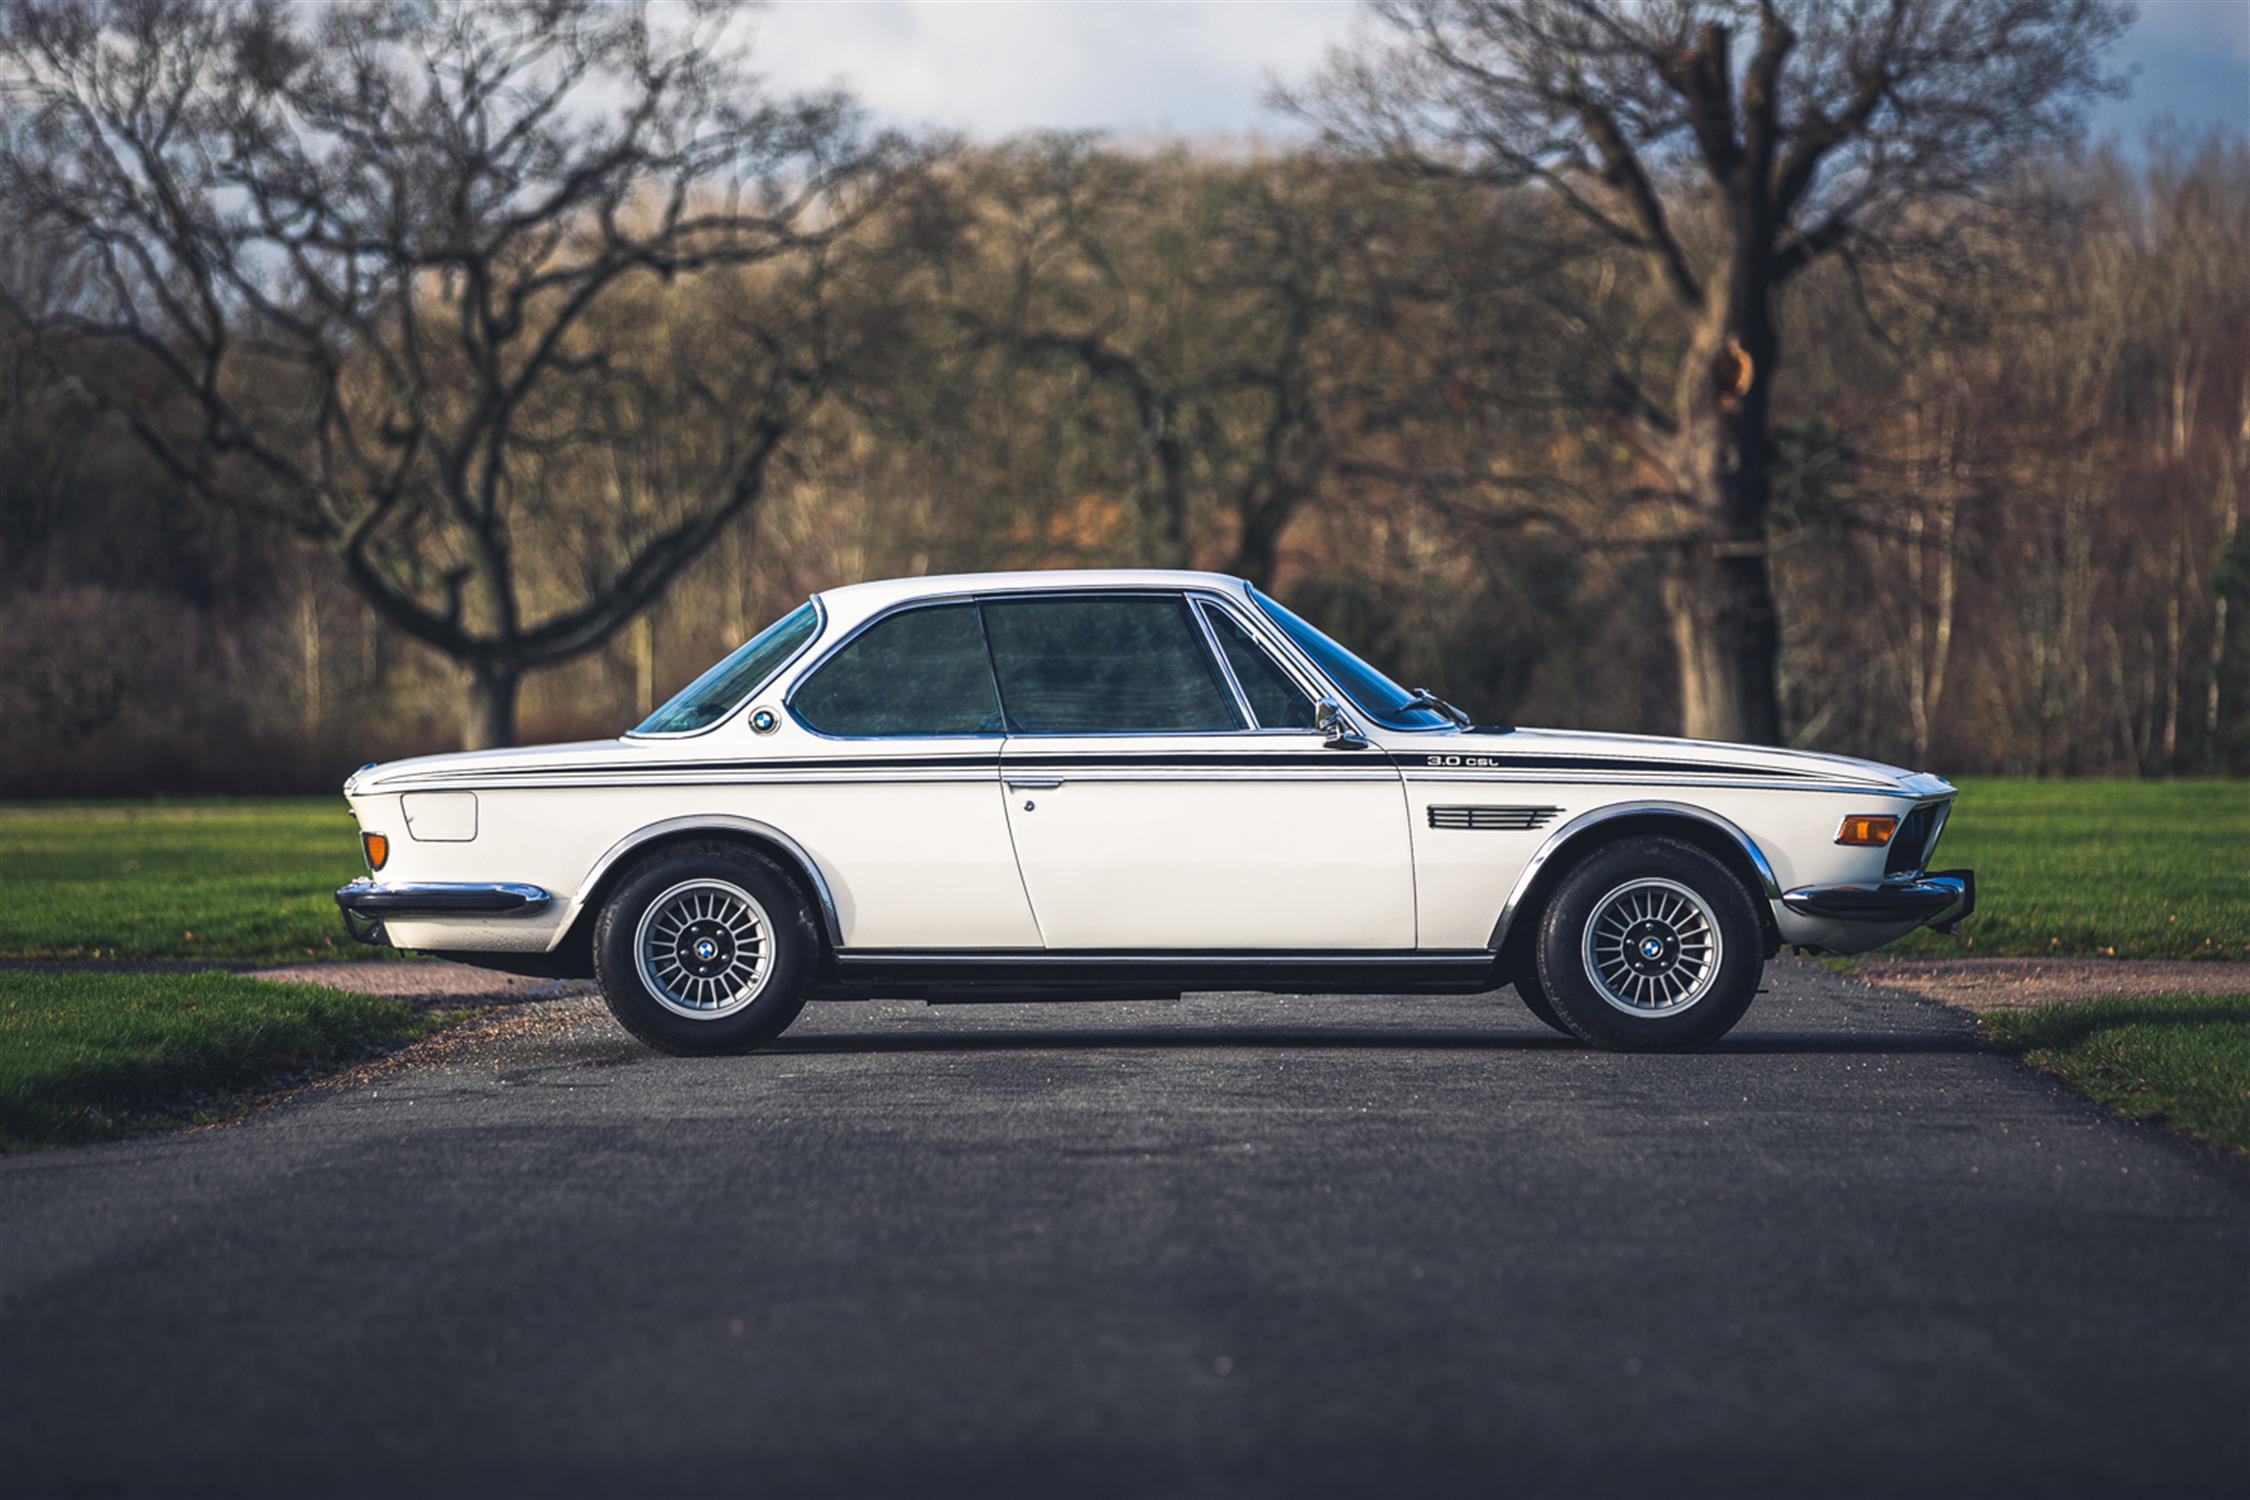 1973 BMW 3.0 CSL - Image 7 of 10